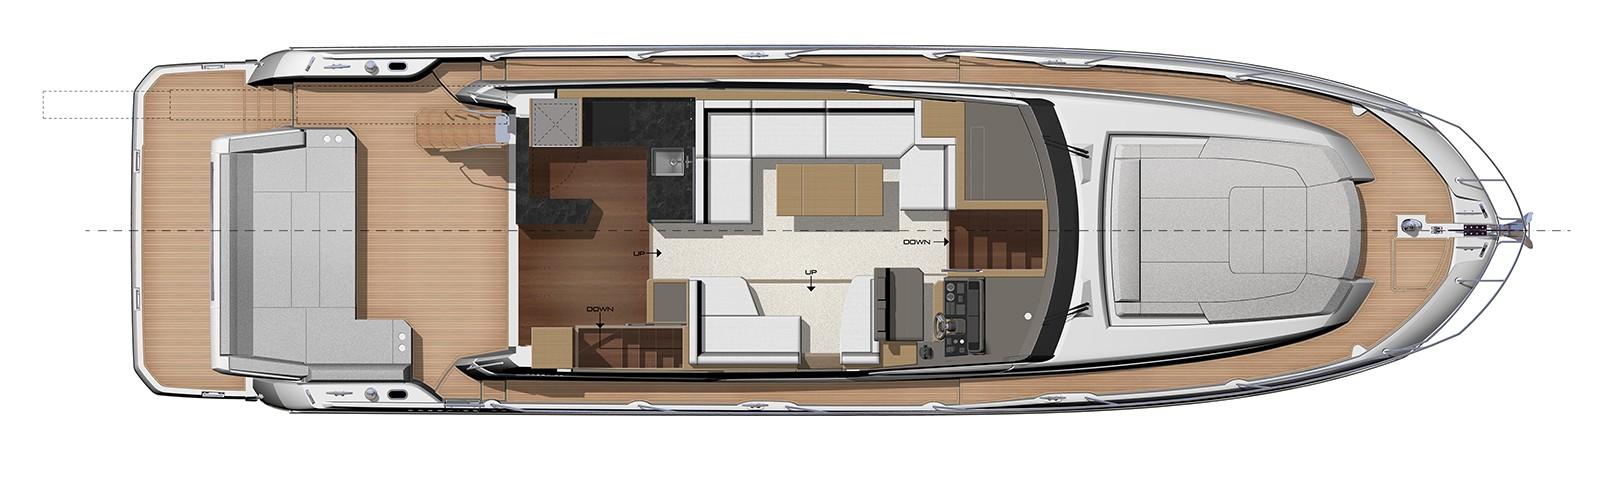 PRESTIGE-590---Main-Deck---Relax-cockpit-